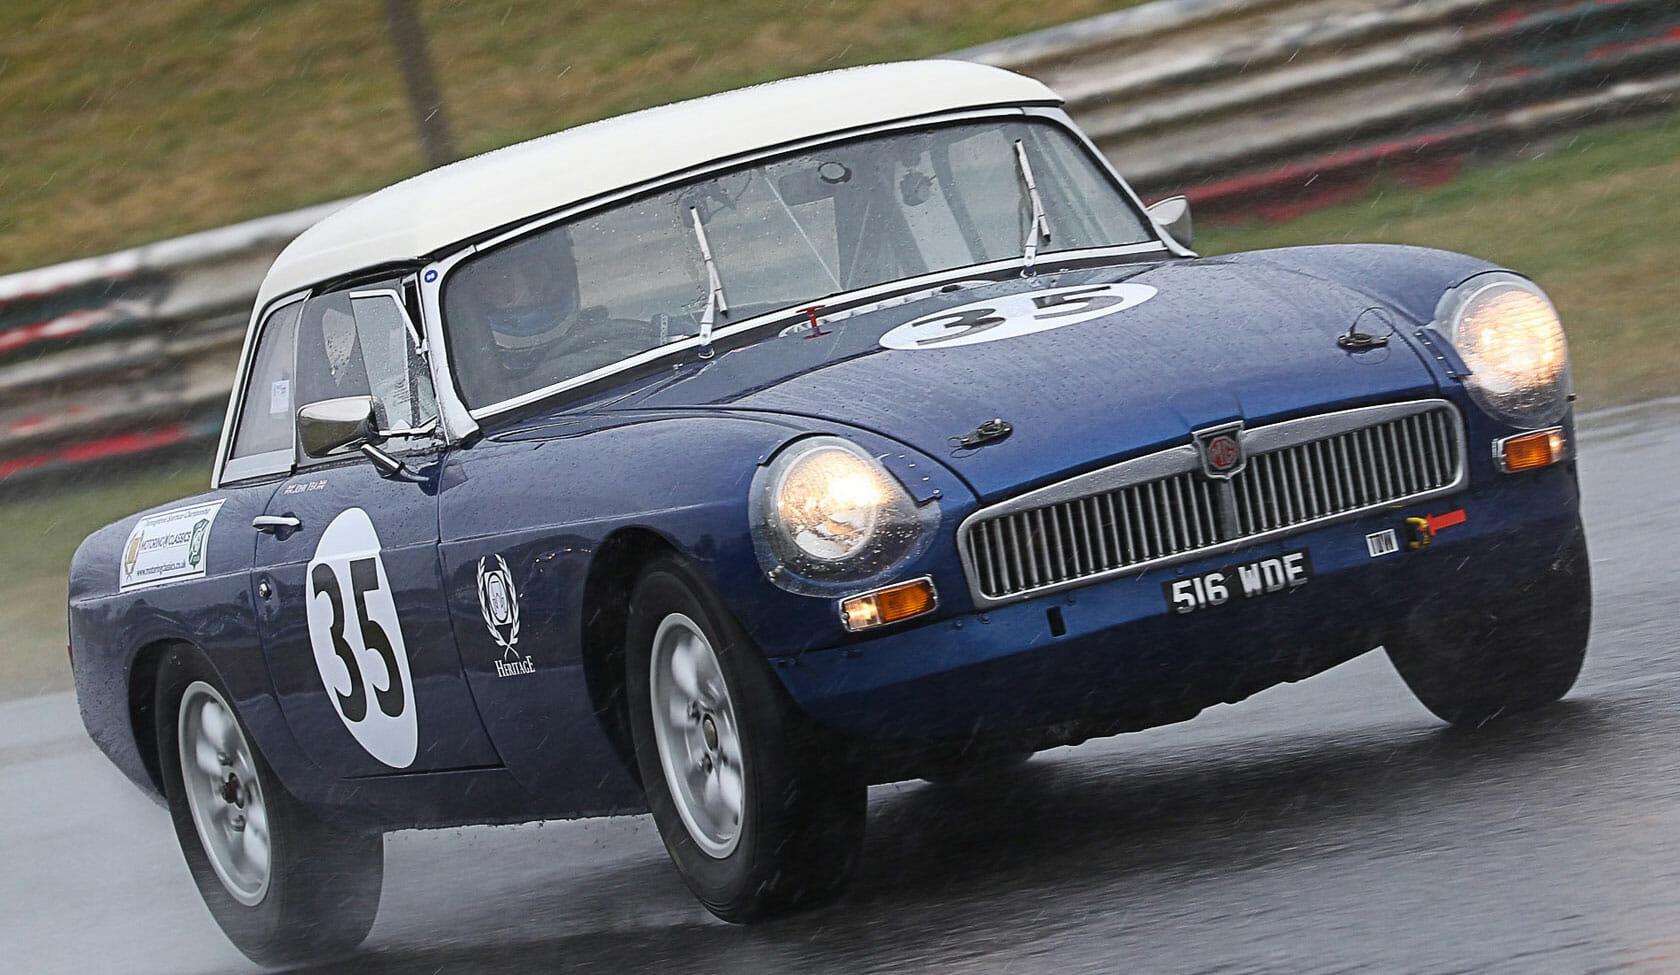 ex MG Racing Wipers